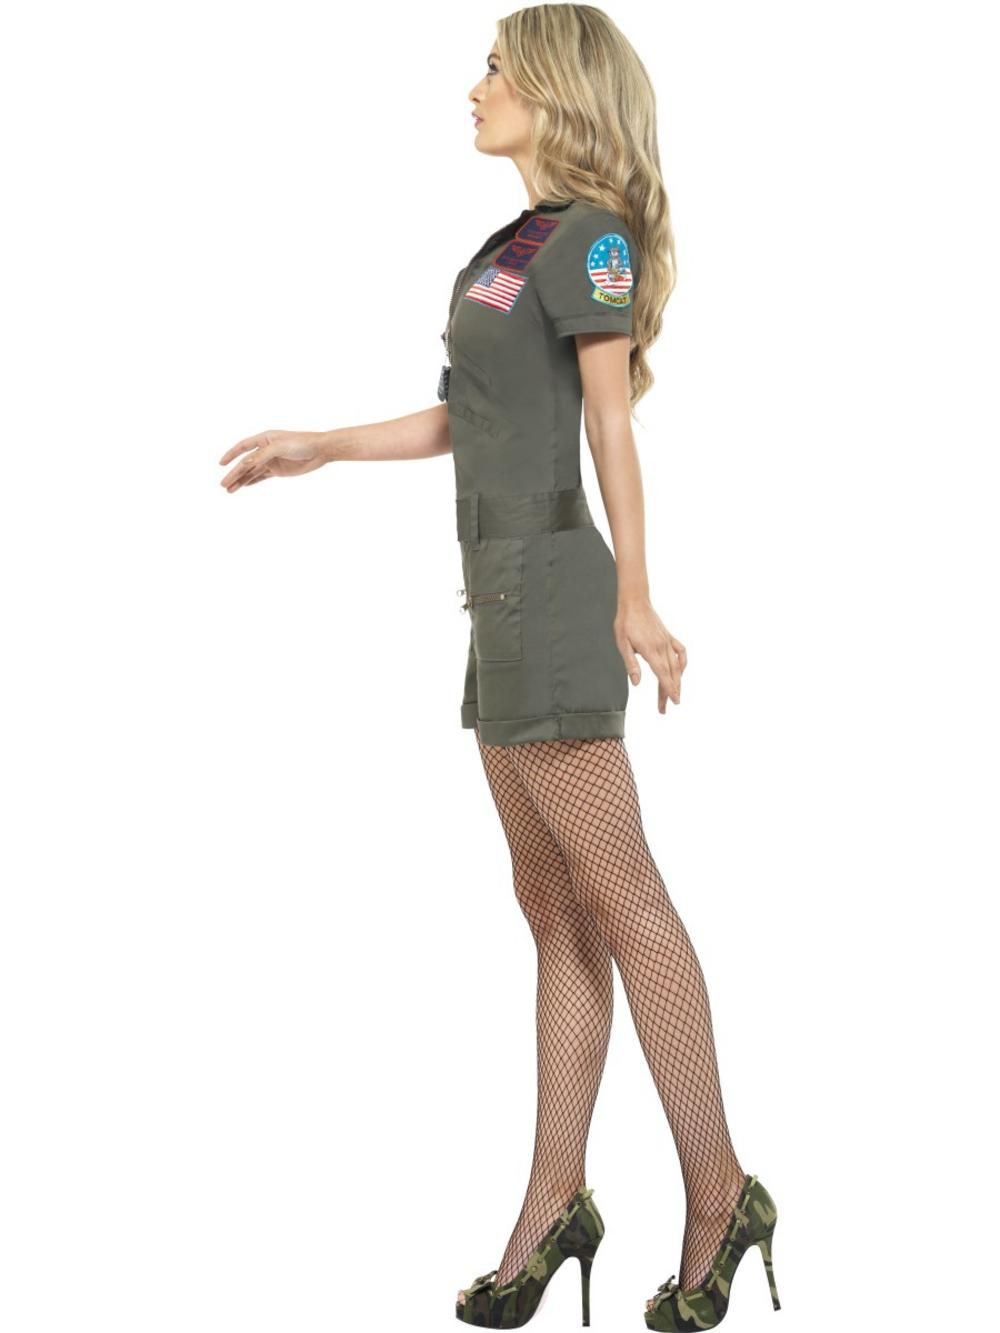 Top Gun Aviator Playsuit Costume All Ladies Costumes